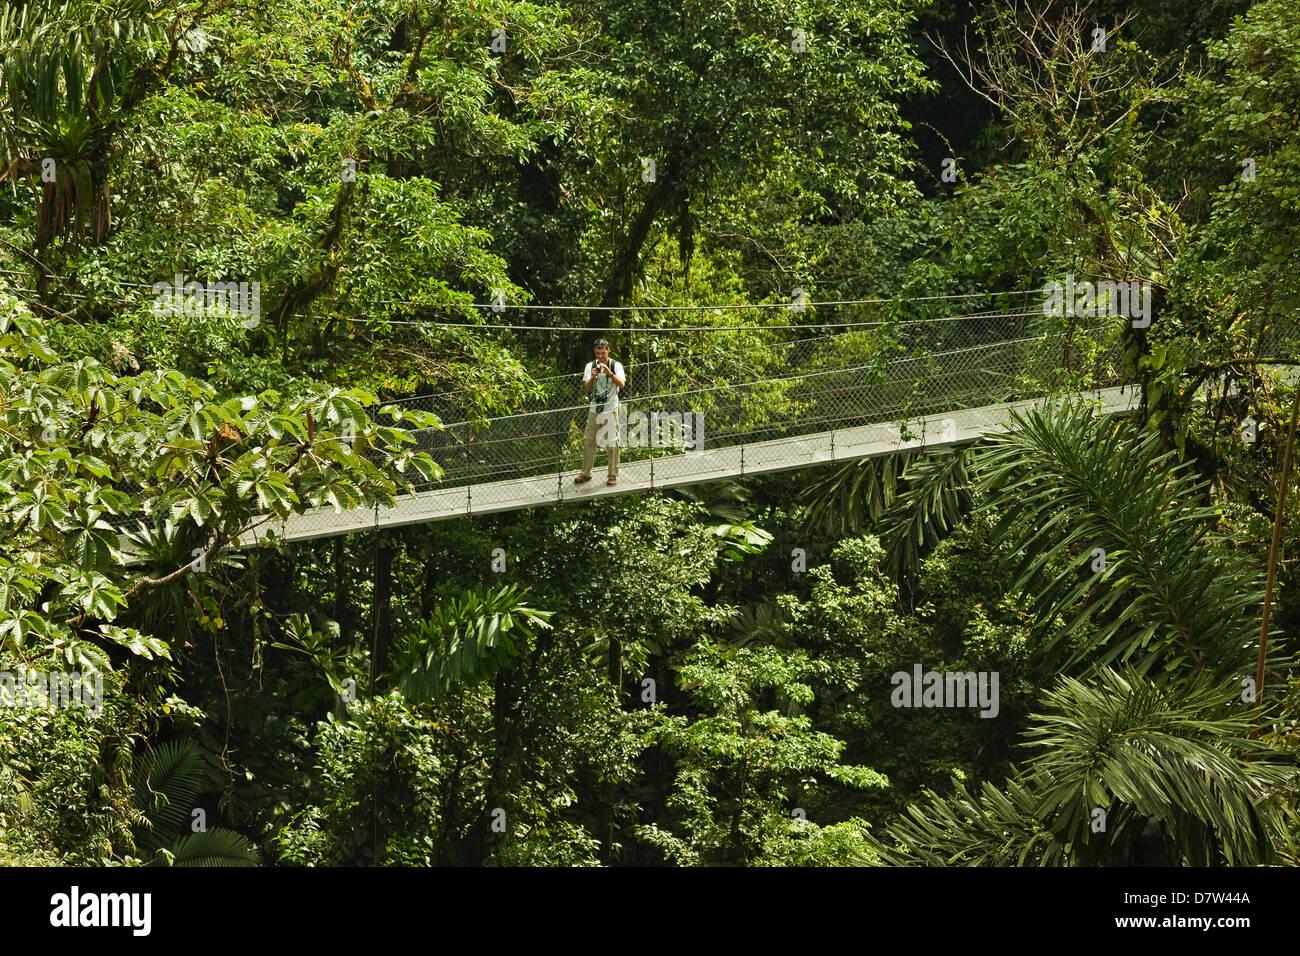 Besucher am Arenal Hängebrücken wo Regenwald über Gehwege, La Fortuna, Provinz Alajuela, Costa Rica Stockbild